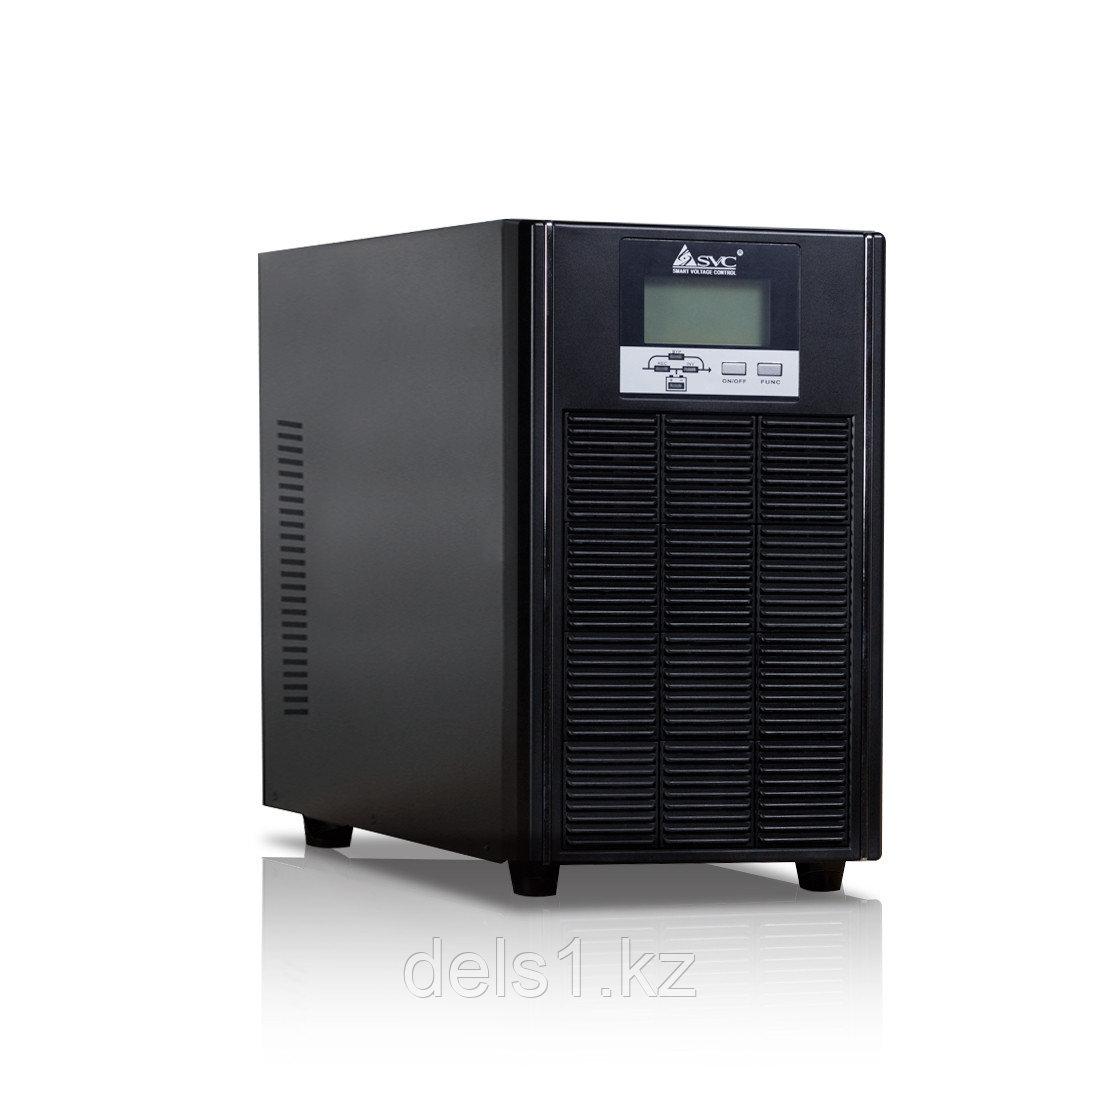 Напольный ИБП (UPS) SVC PTX-6KL-LCD